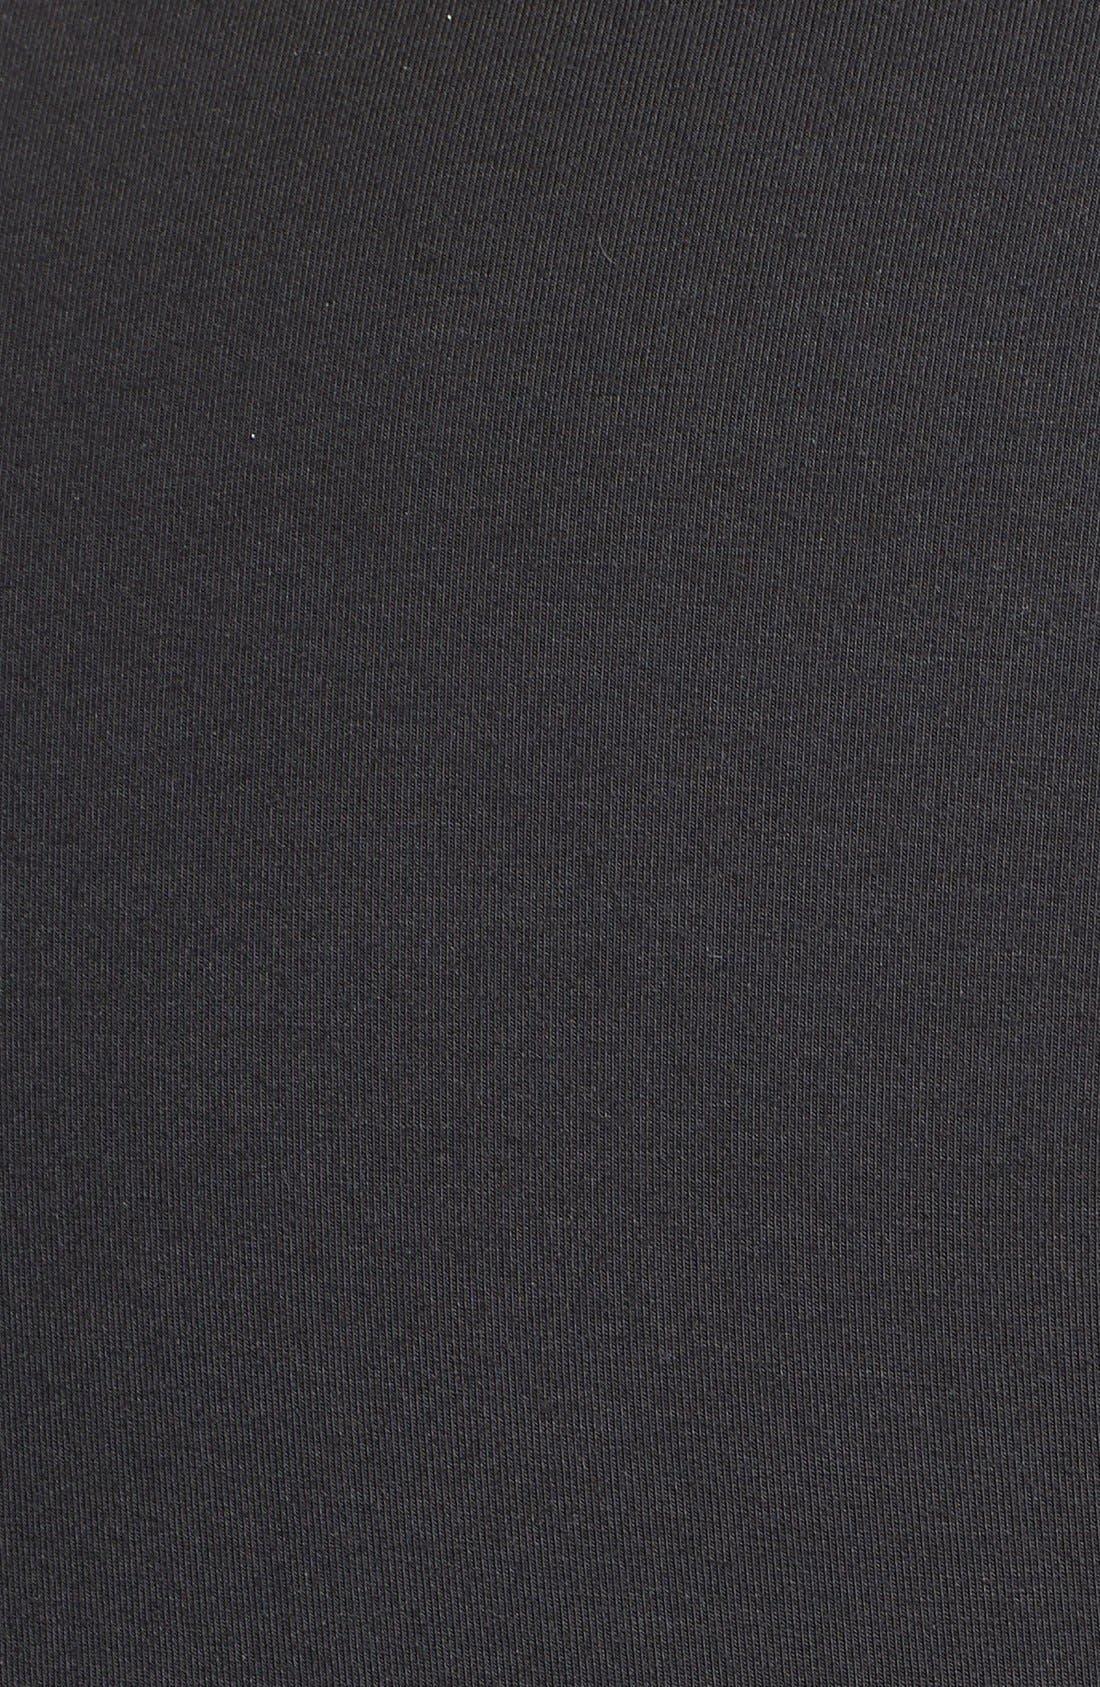 'Whitney' Maternity Dress,                             Alternate thumbnail 3, color,                             001